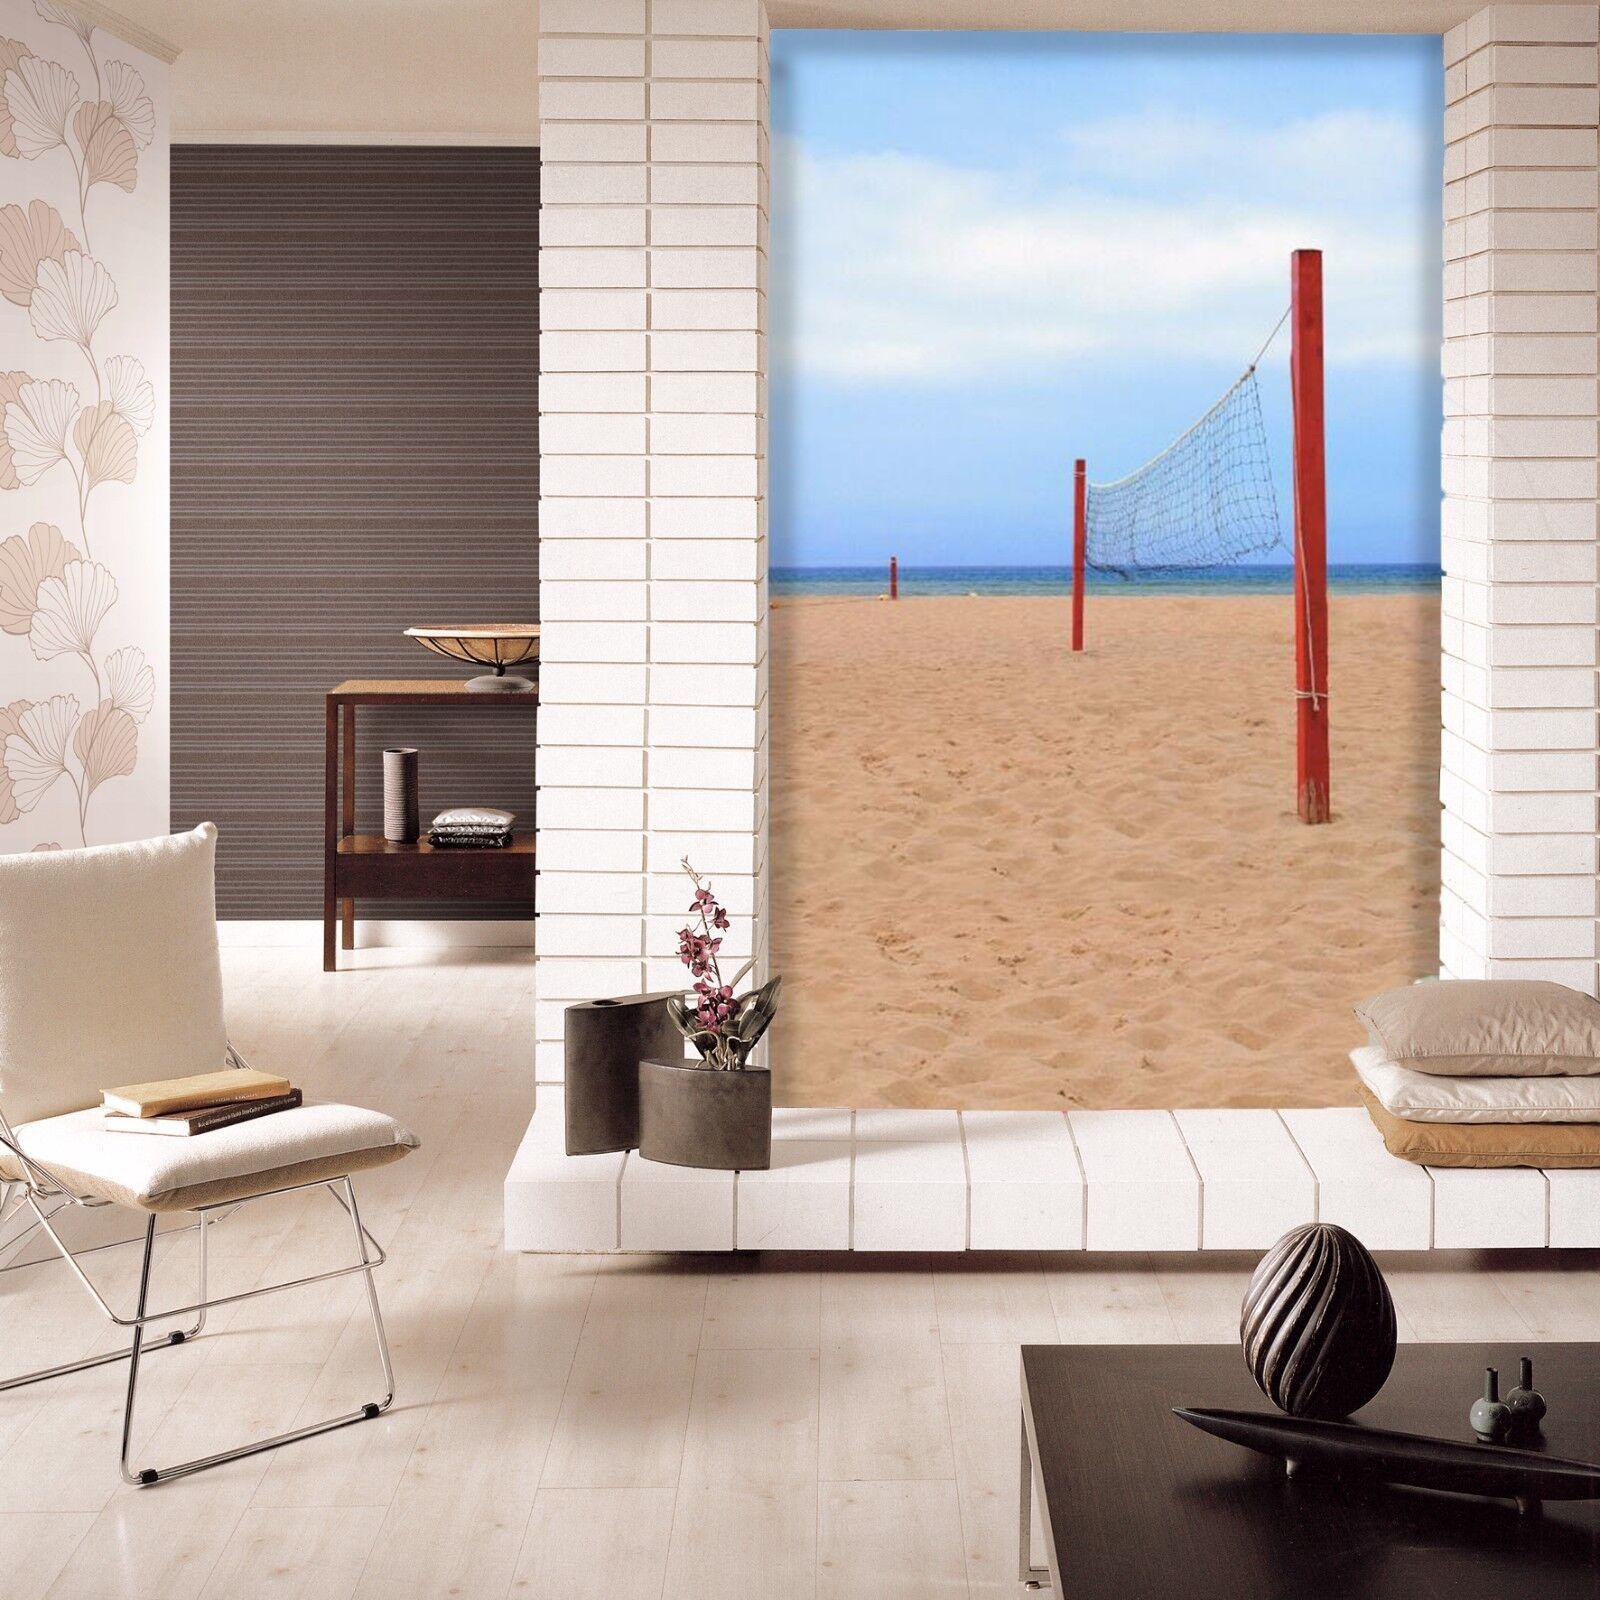 3D Beach Volleyball Net 01 Paper Wall Print Wall Decal Wall Deco Indoor Murals